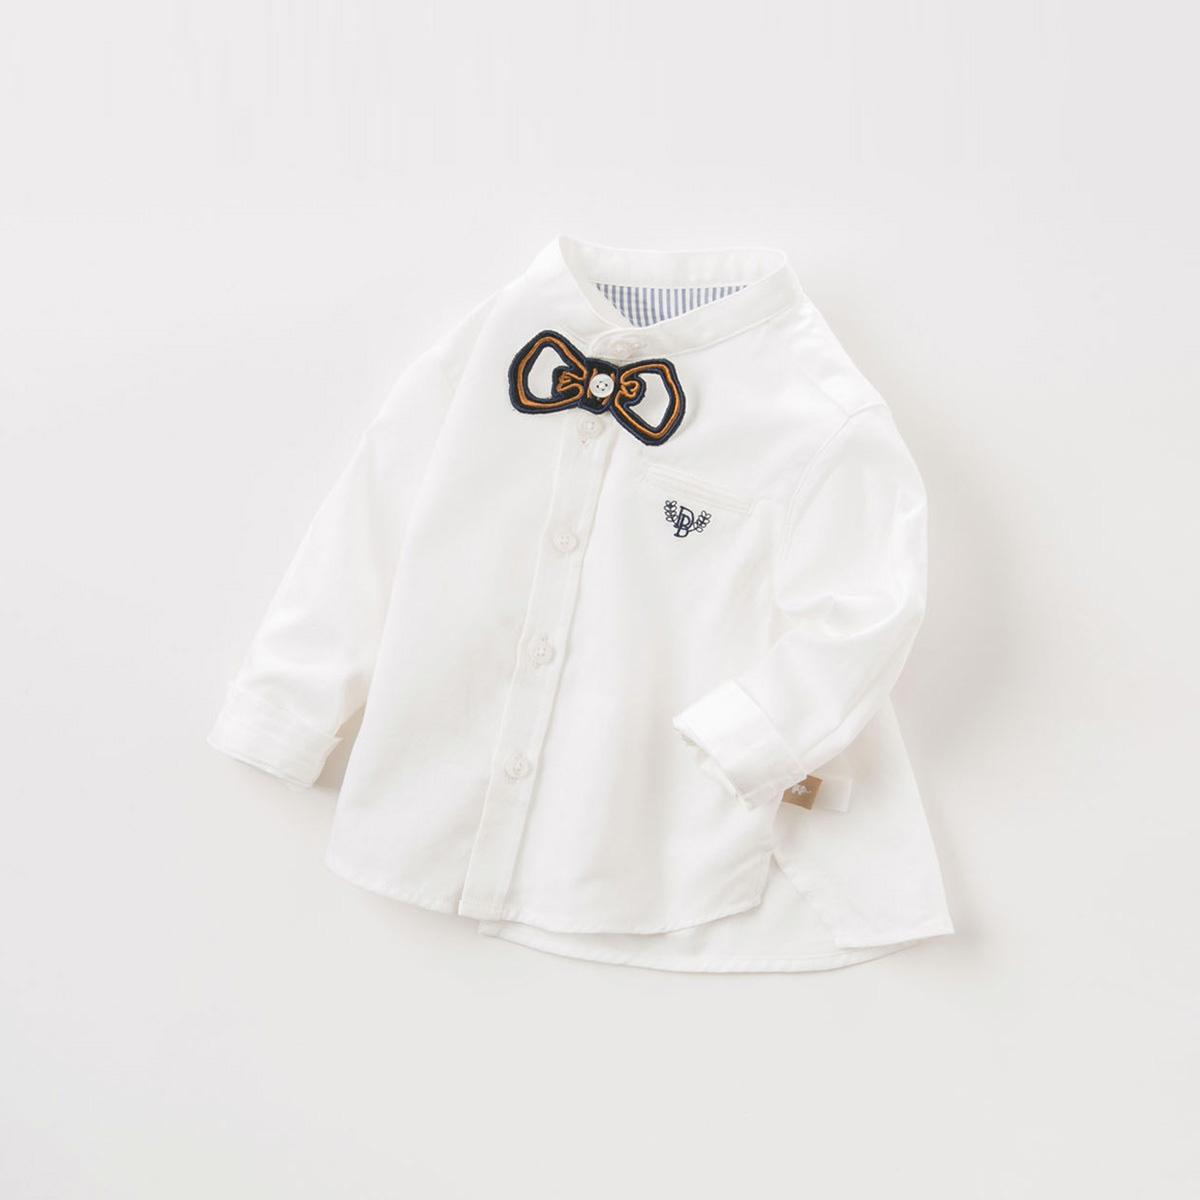 davebella戴维贝拉2018秋季新款男童衬衫宝宝全棉绅士衬衣DB9226